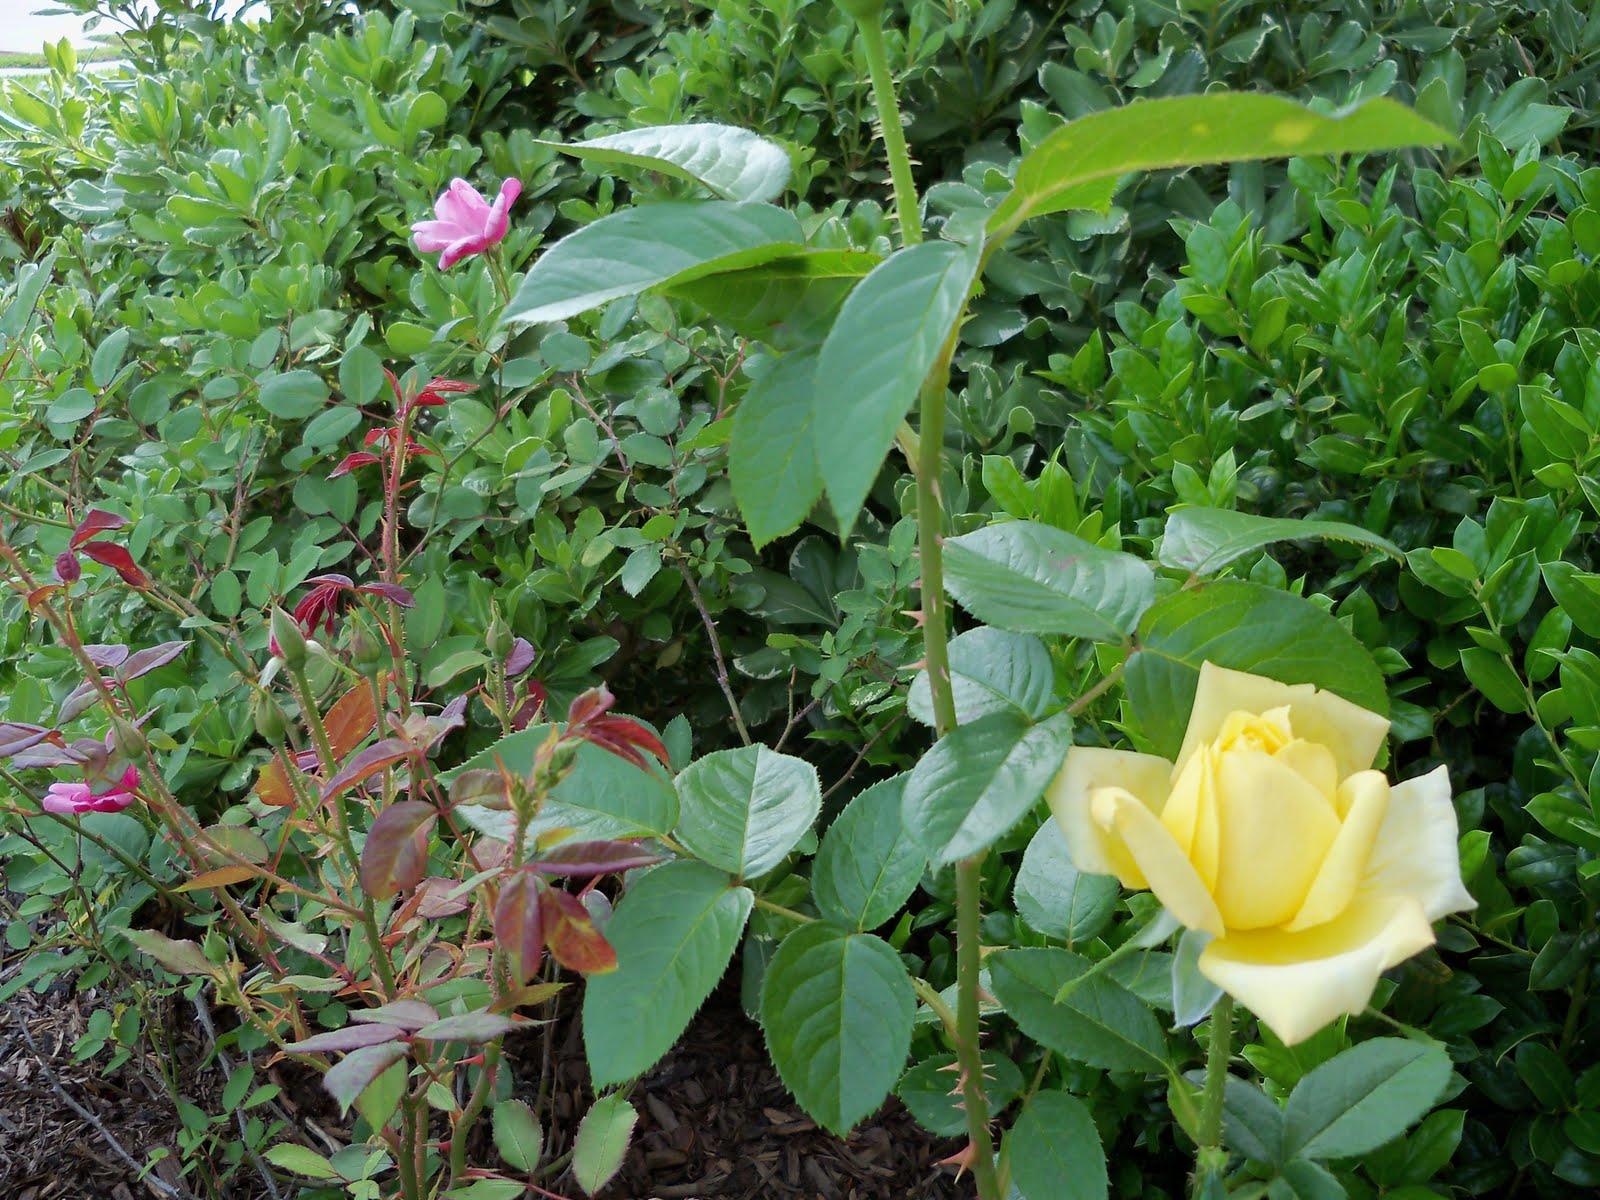 Gardening 2010 - 101_1441.JPG